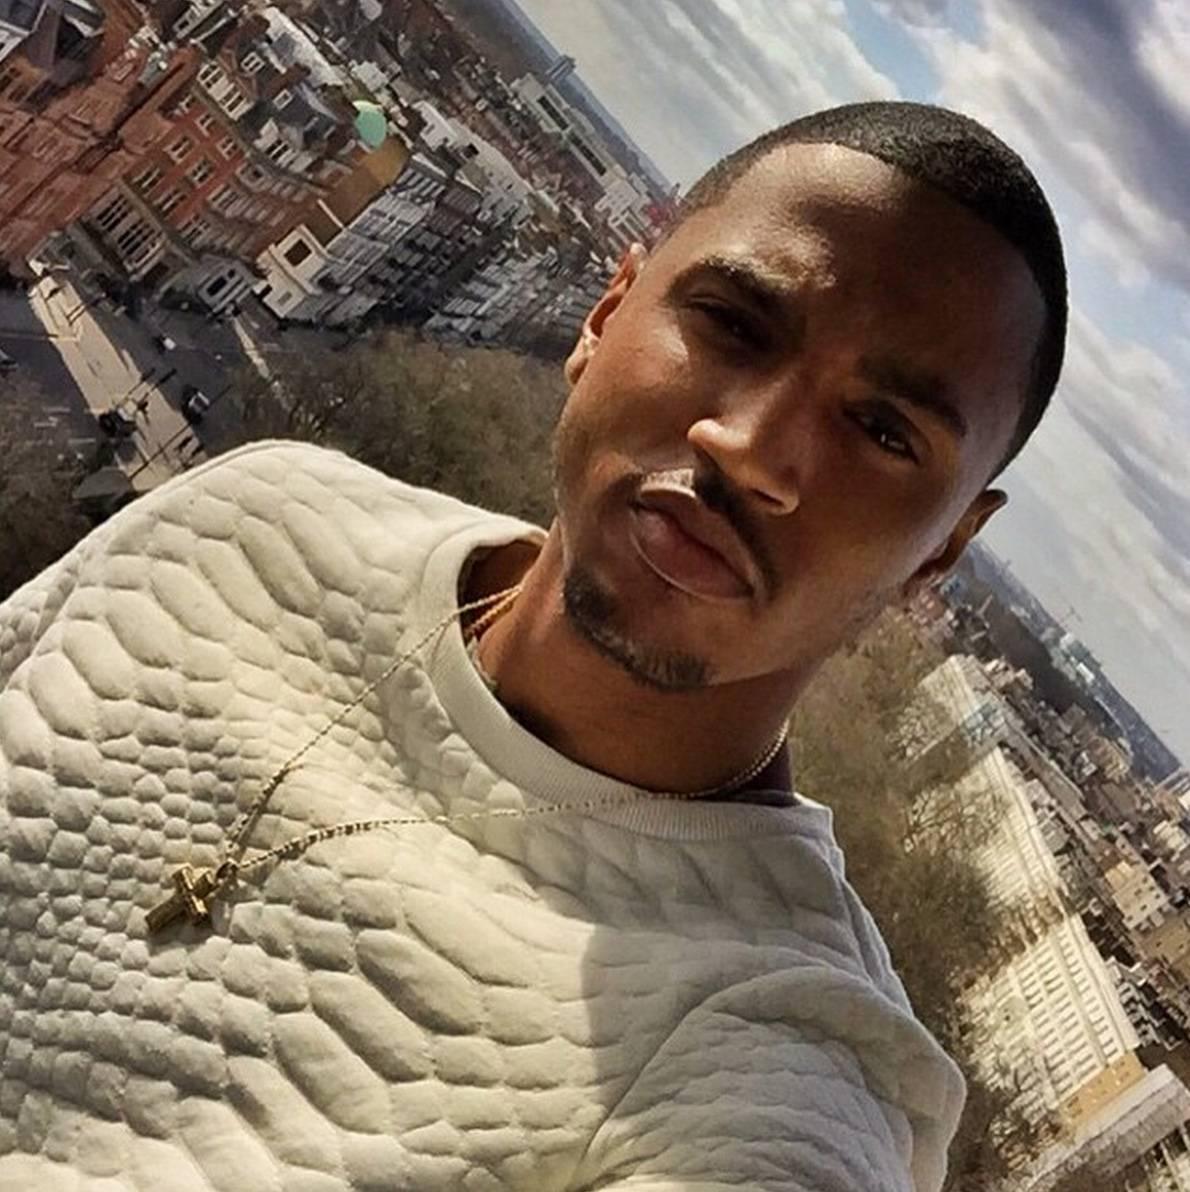 Wearing a Sweater = Cuddle Season Approaching - Why Trey? Why?   (Photo: Trey Songz via Instagram)